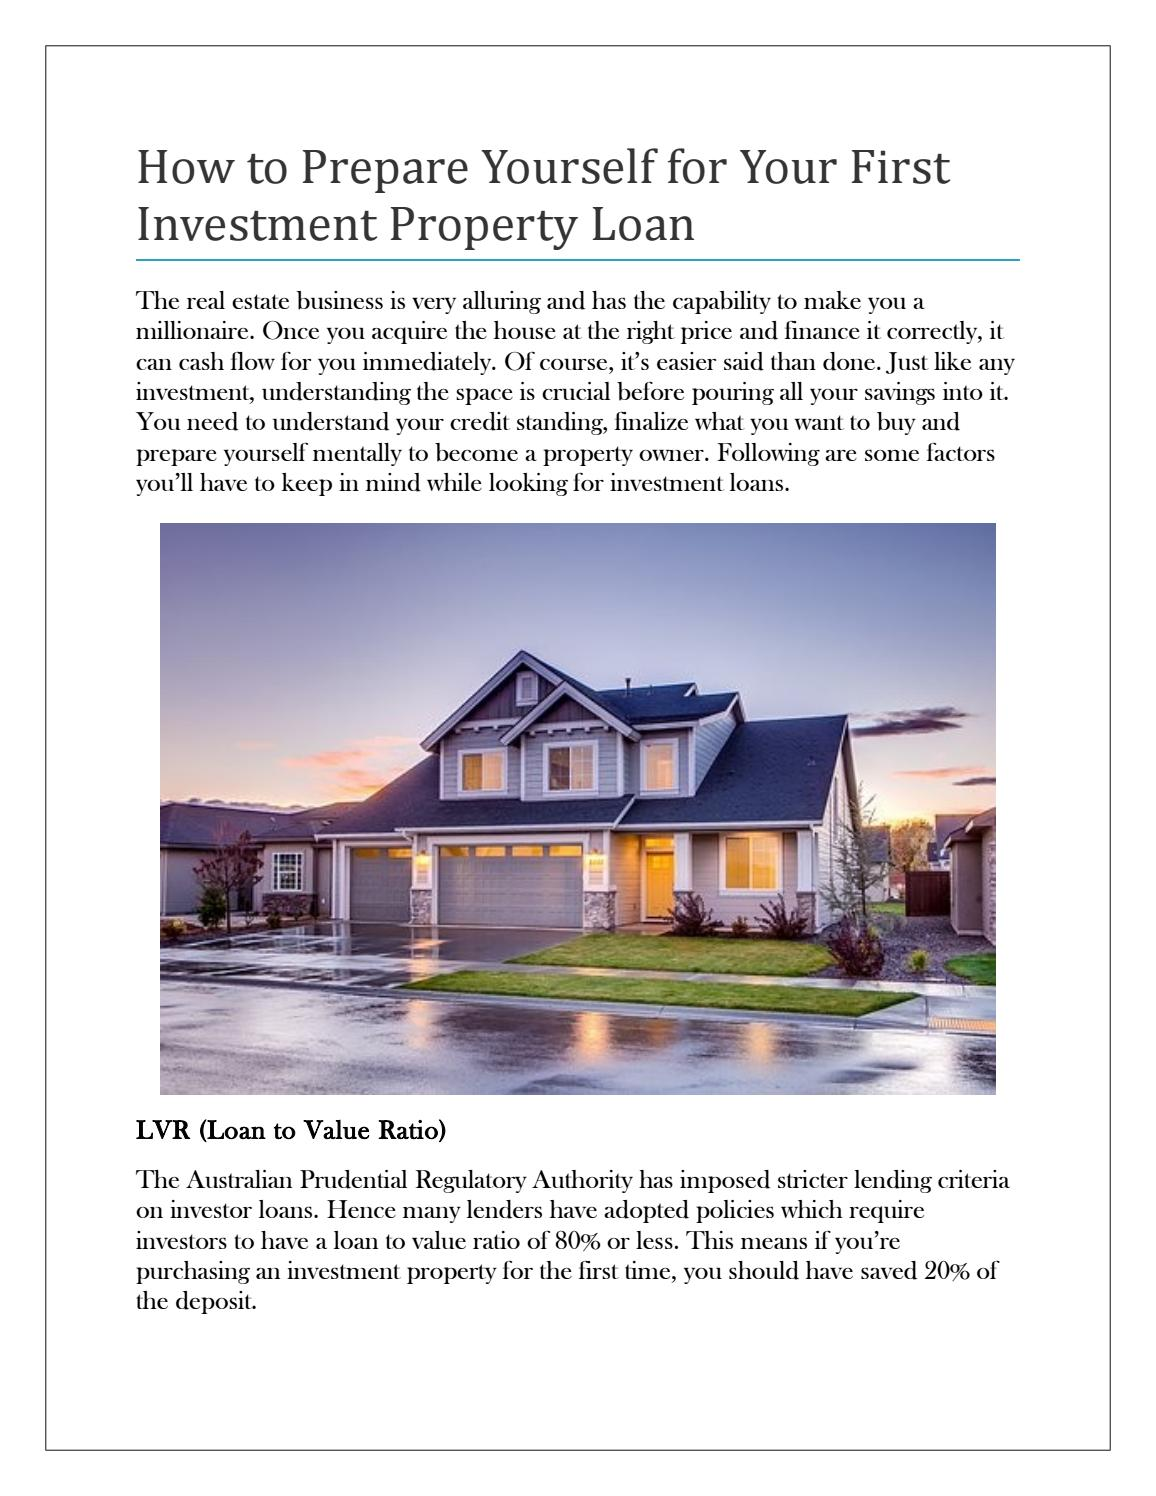 20 investment property mortgage global futures forex ltd ada mi